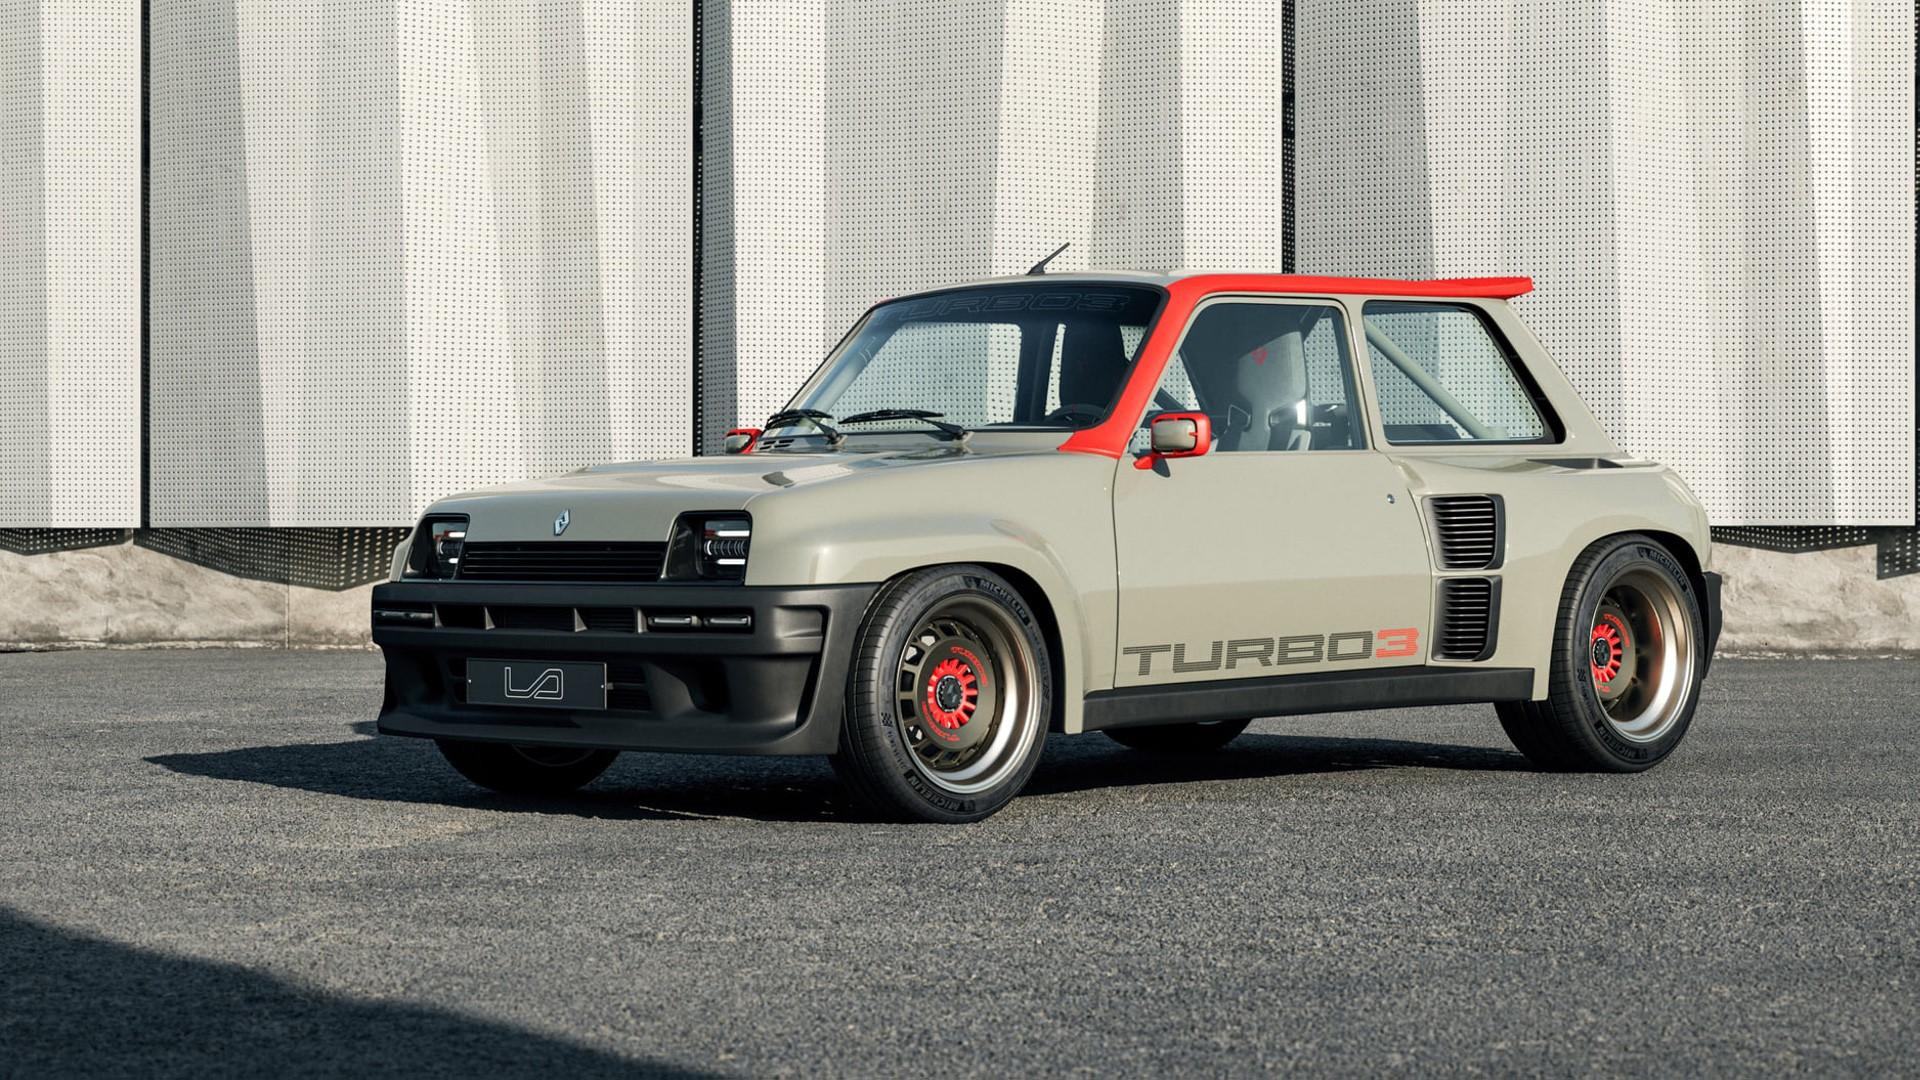 Renault-5_Turbo_3-0009